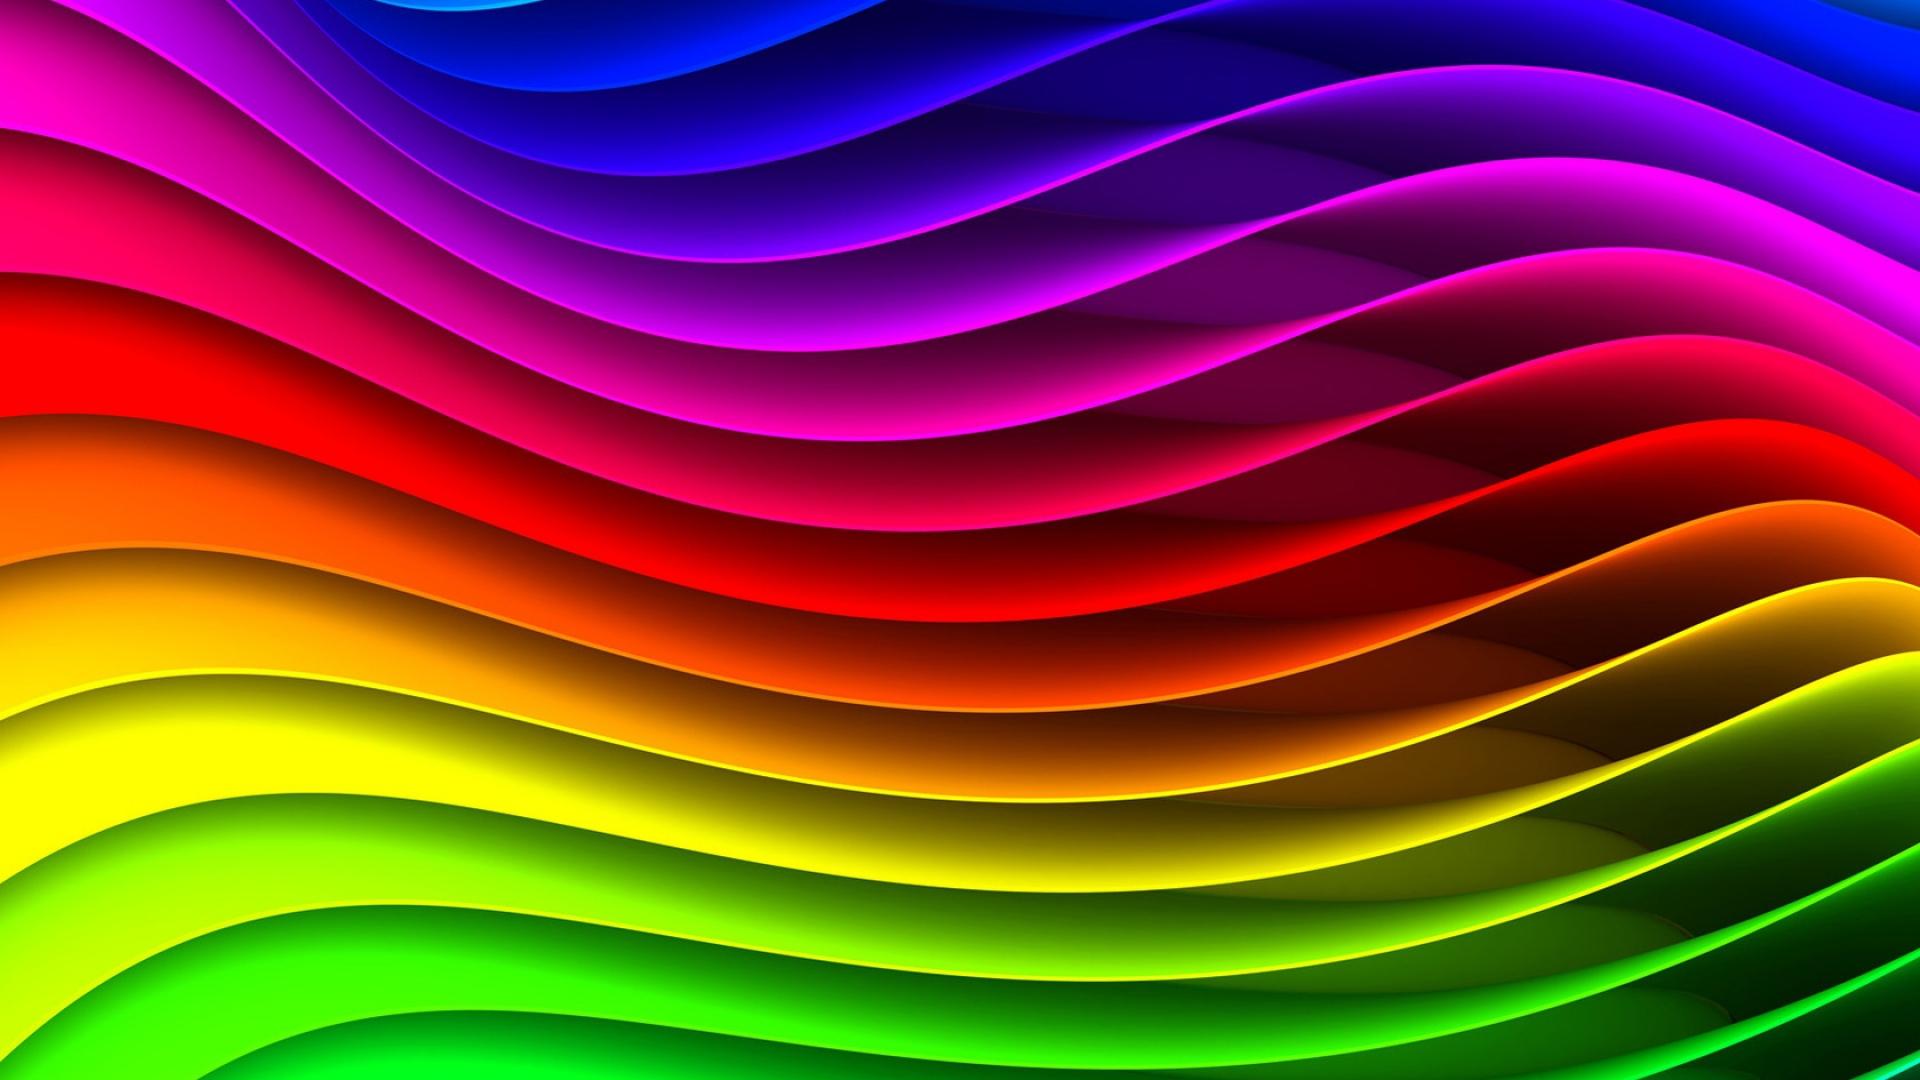 Background Hd Wallpaper Girl Download Wallpaper 1920x1080 Spectrum Rainbow Background